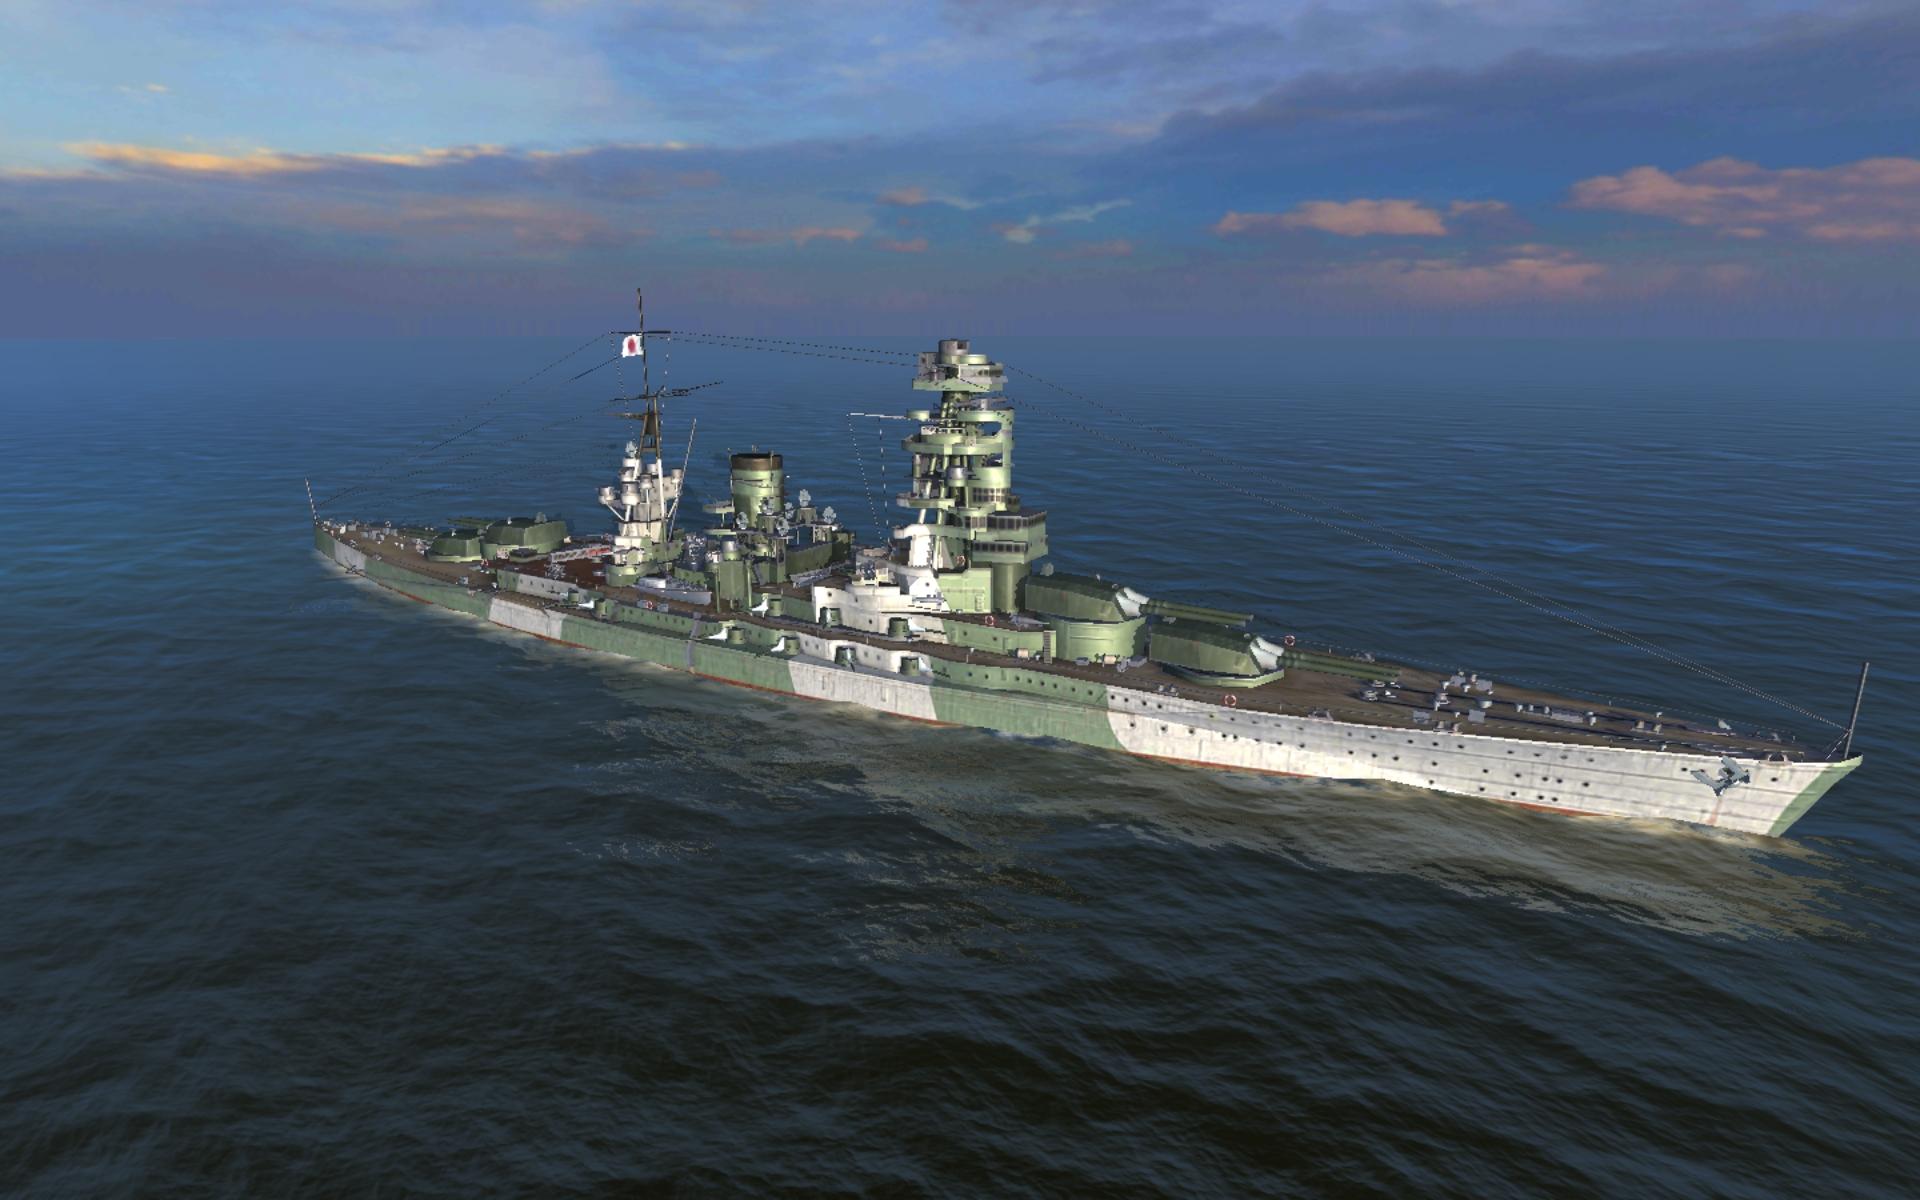 Nagato | World of Warships Blitz Wiki | FANDOM powered by Wikia